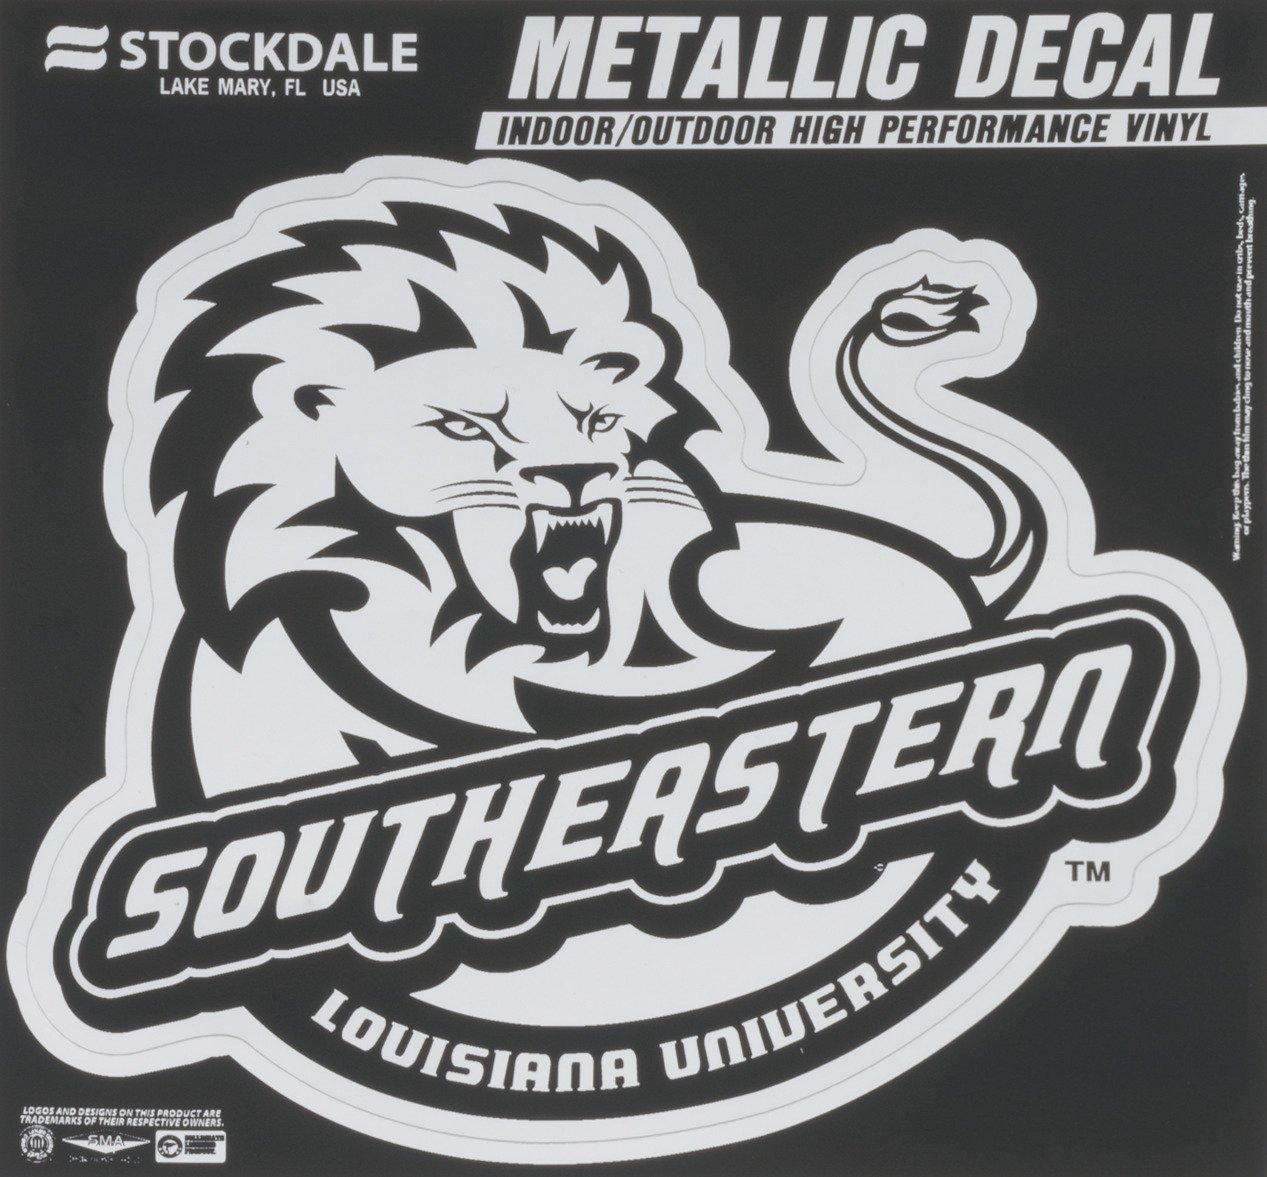 Stockdale Southeastern Louisiana University Decal